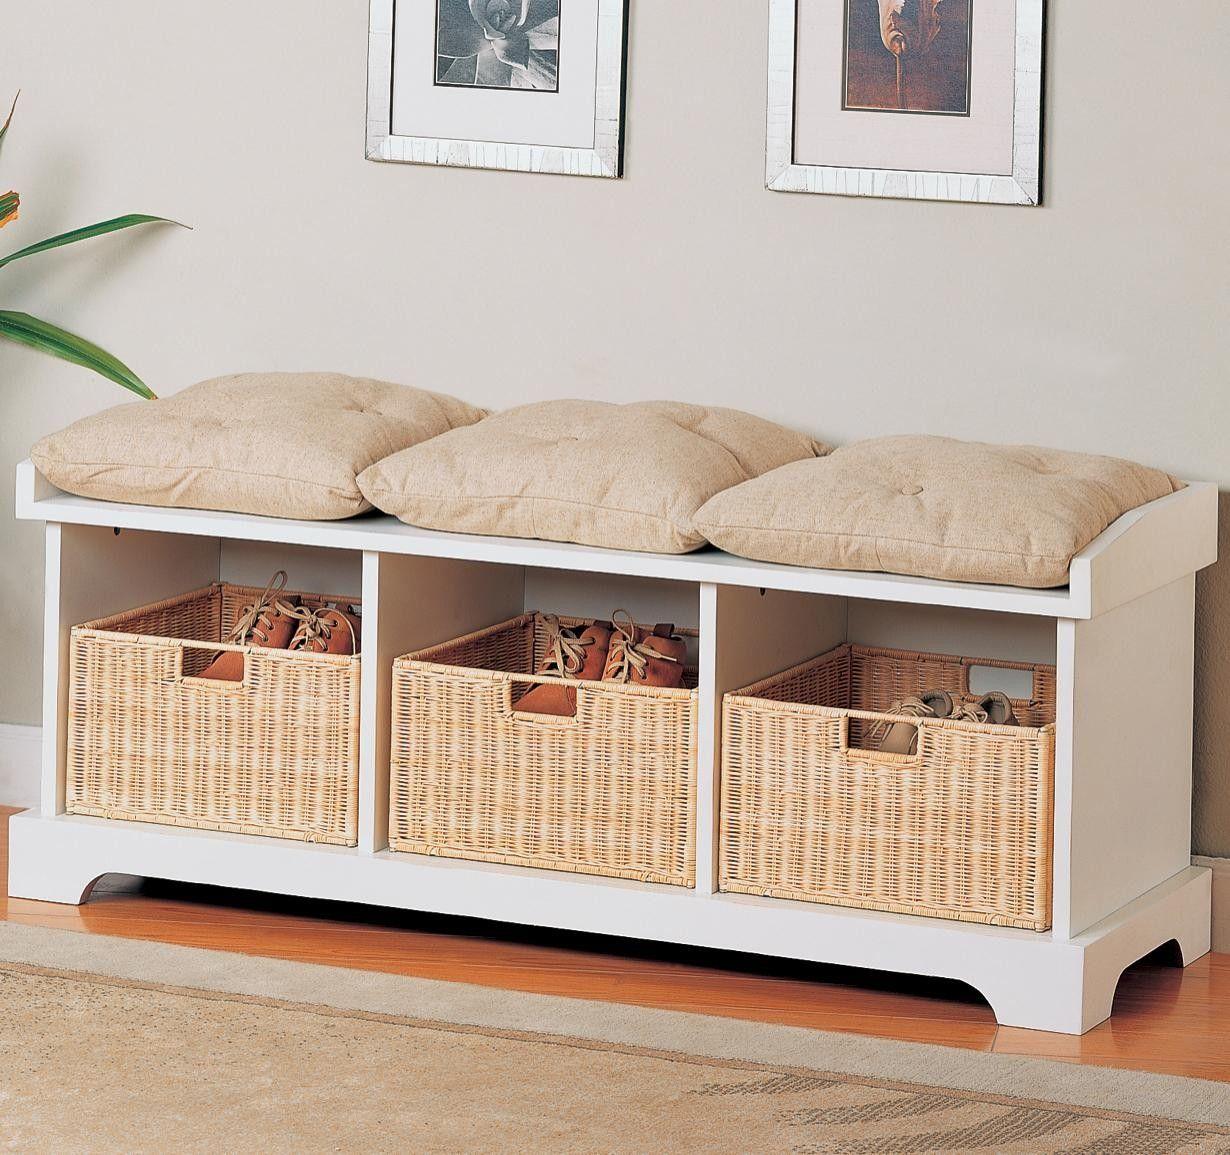 Build a Bench with Storage Baskets in 2020 White storage